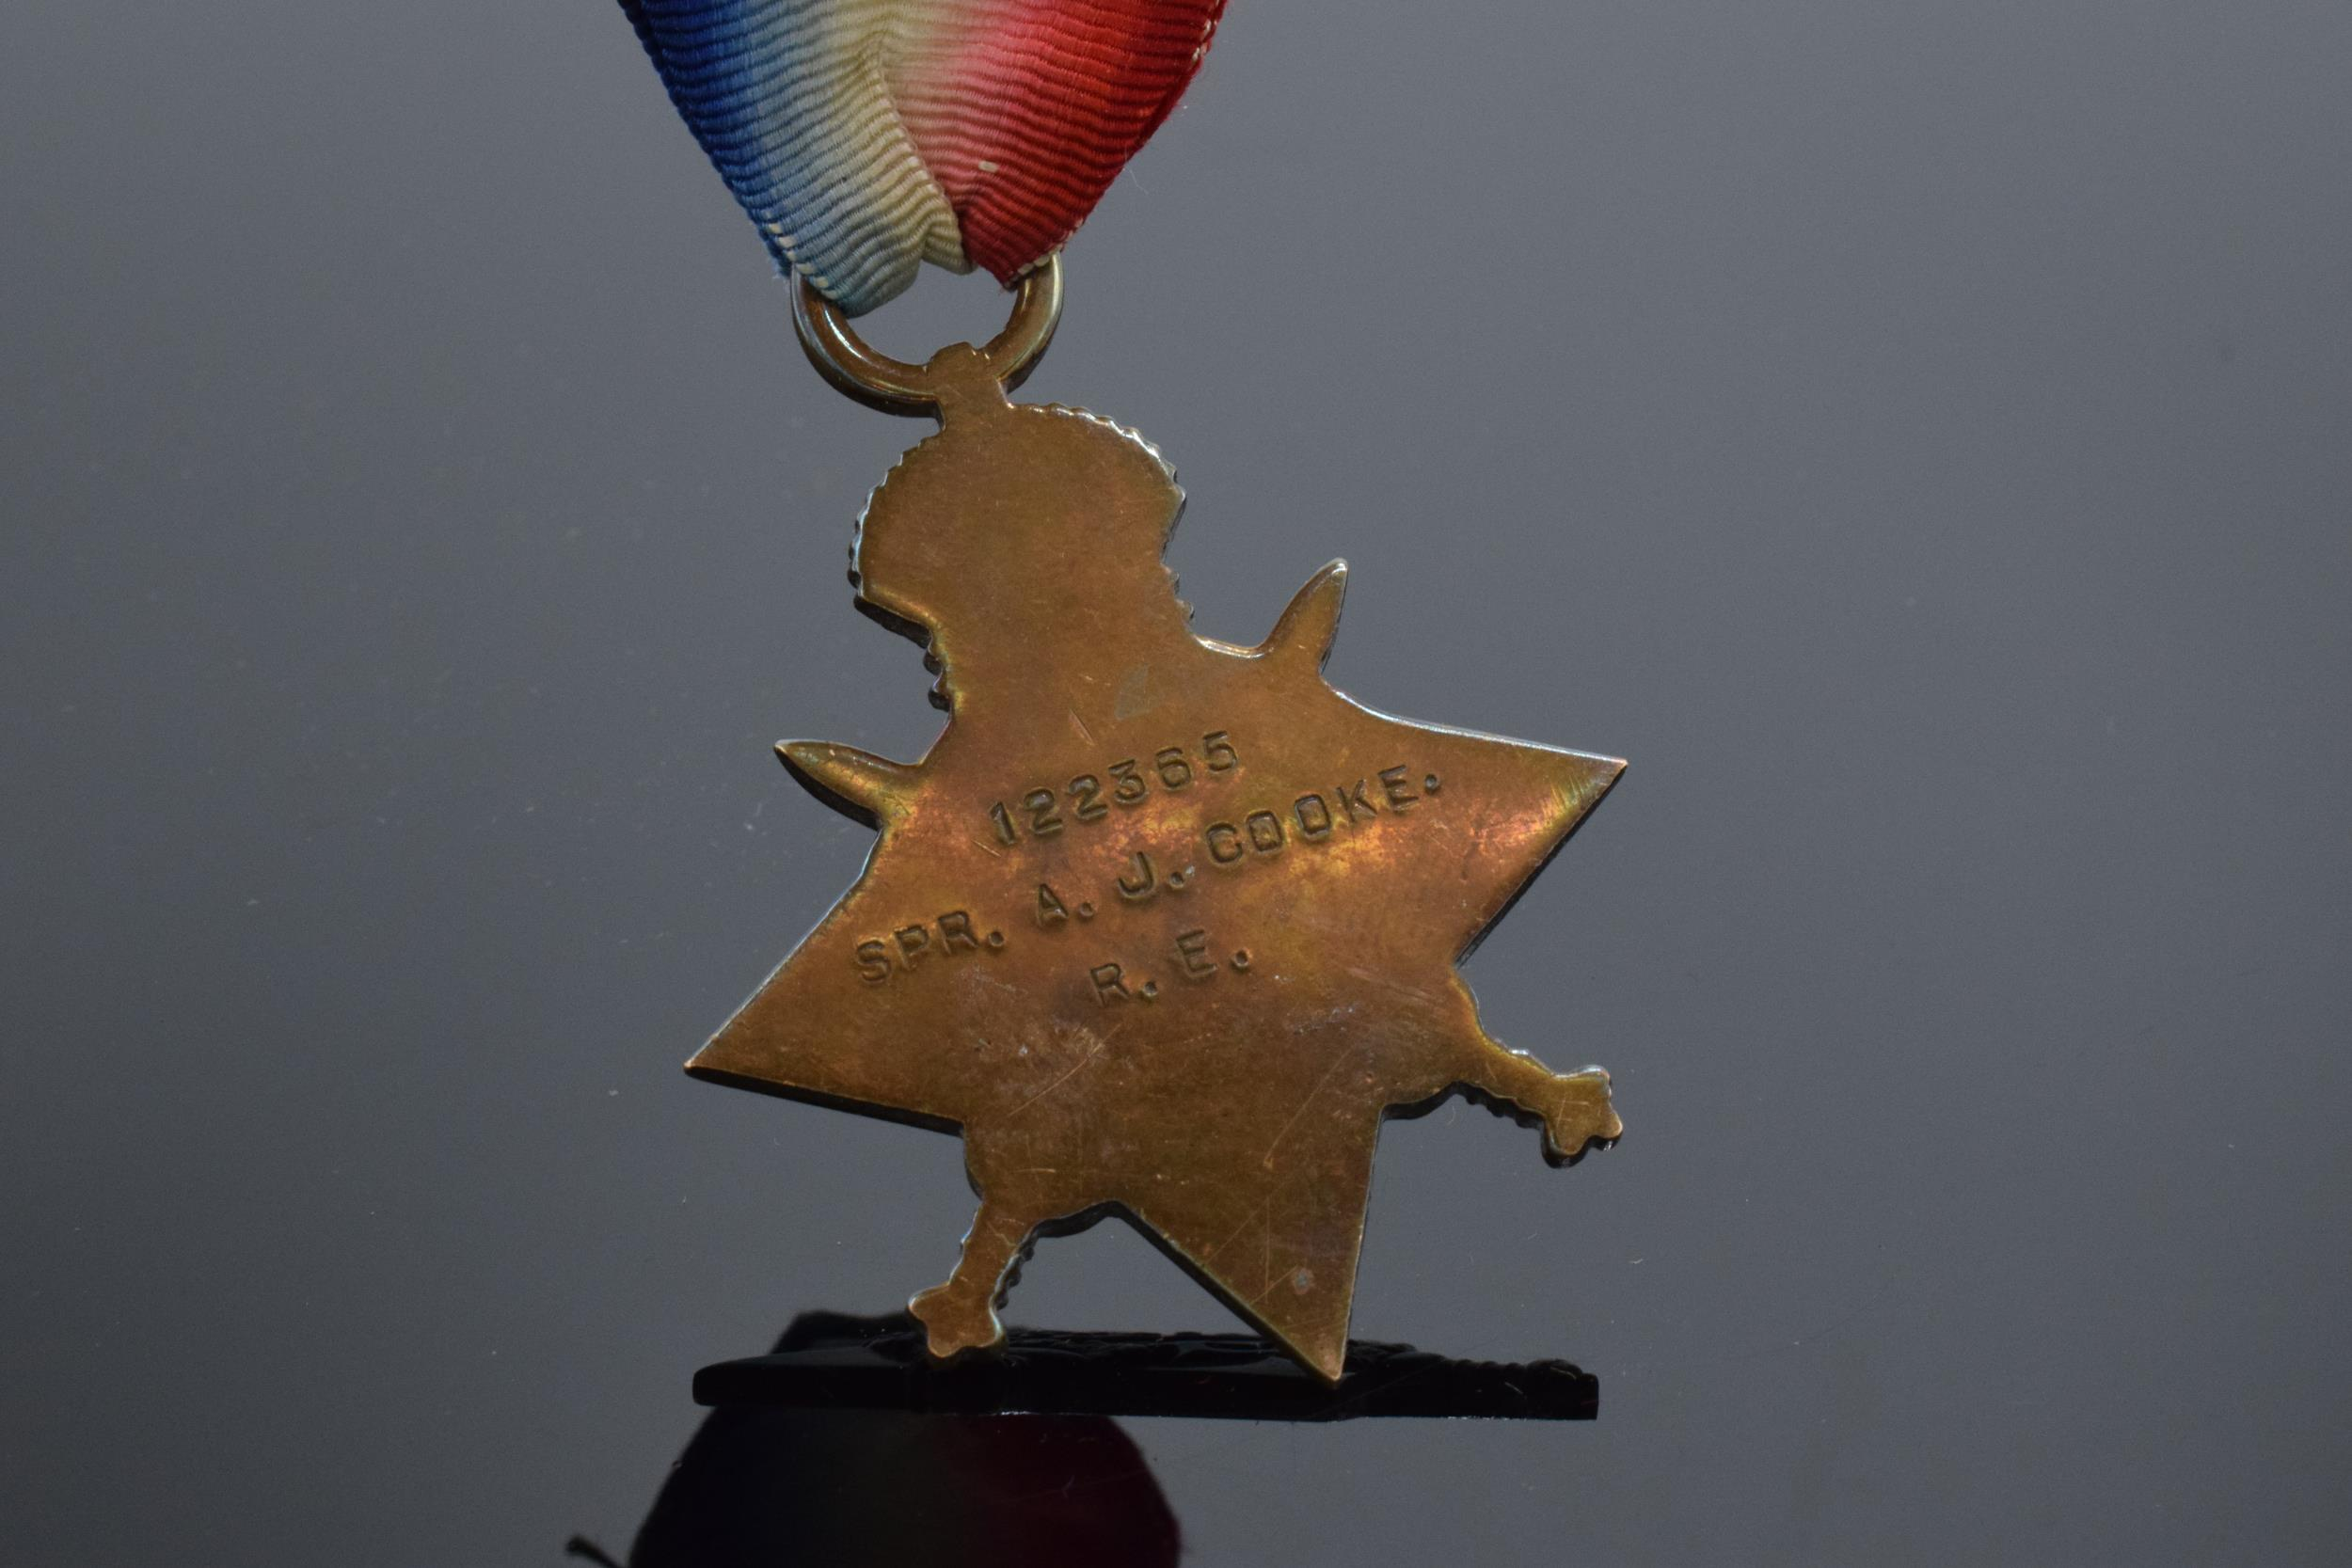 1914-1915 George V star medal on ribbon. '122365 SPR. A.J.Cooke R.E.' - Image 4 of 4